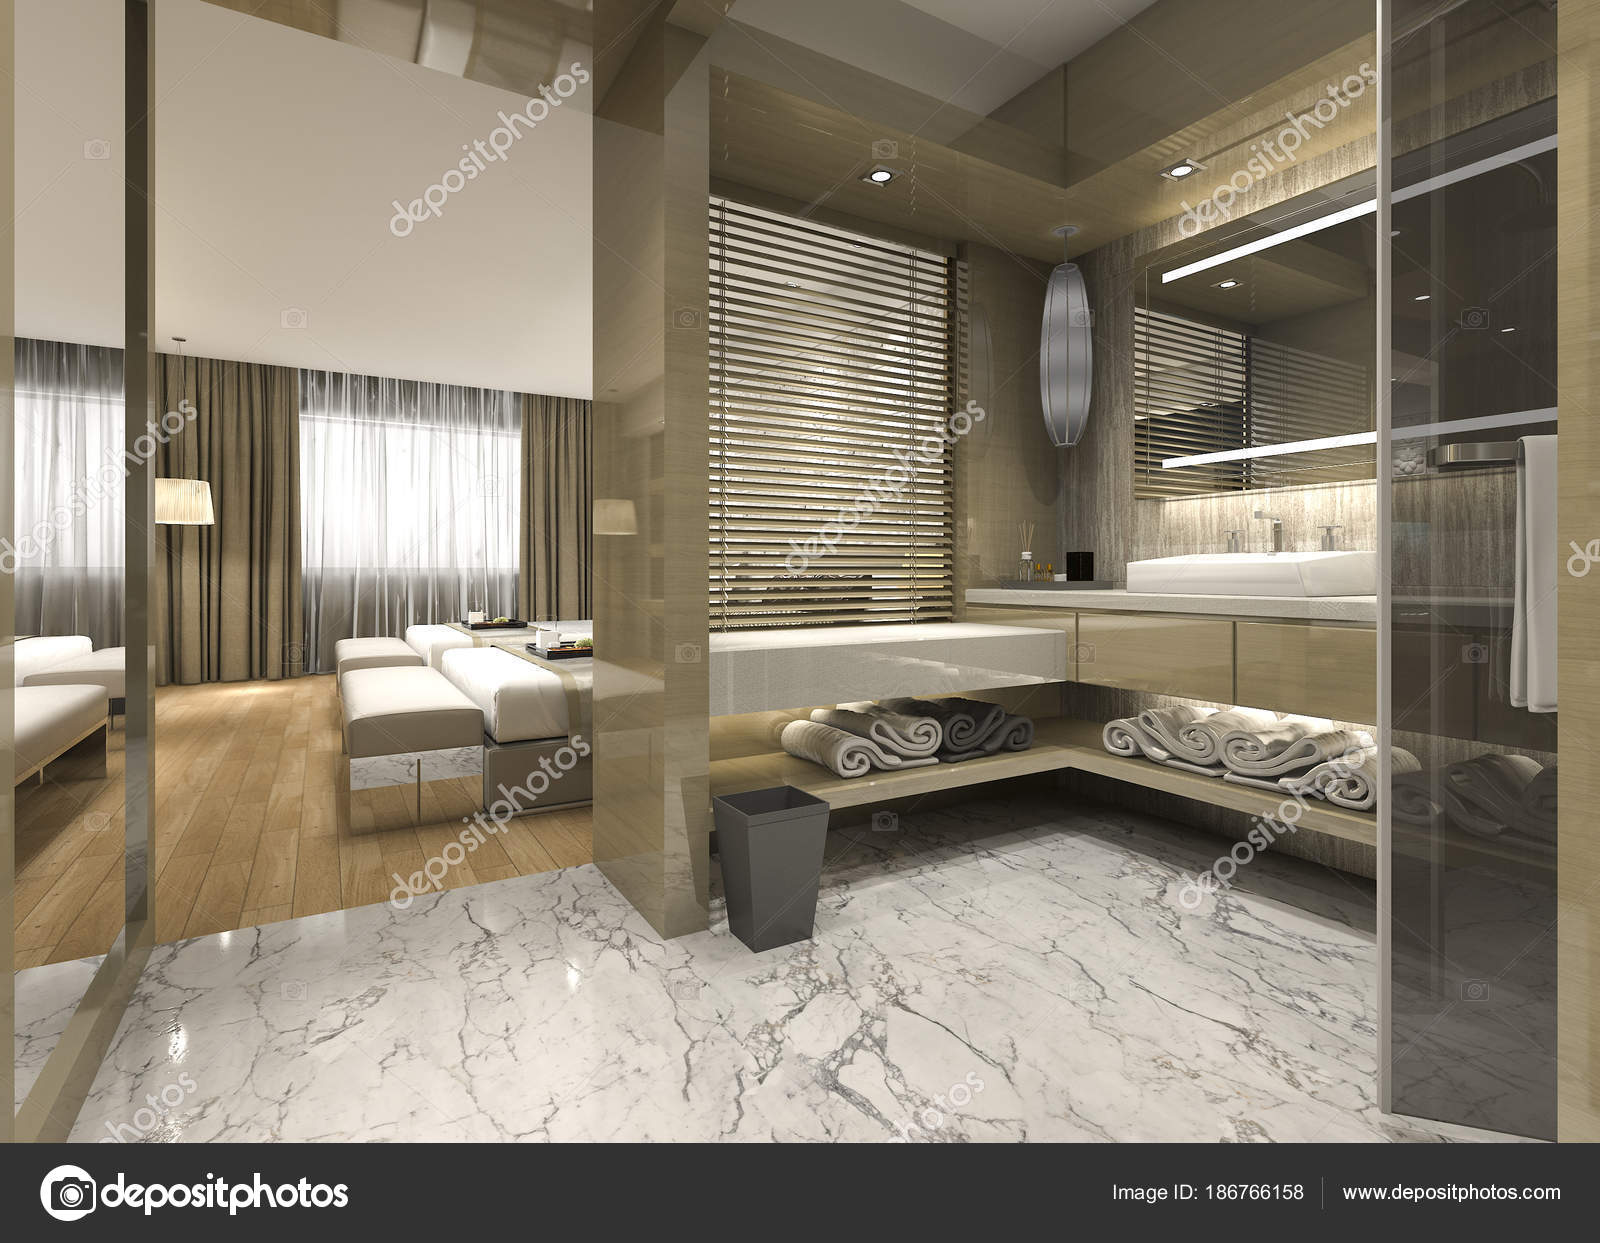 Salle De Bain Luxueuse Moderne ~ rendu moderne bois salle bain luxueuse suite hotel photographie